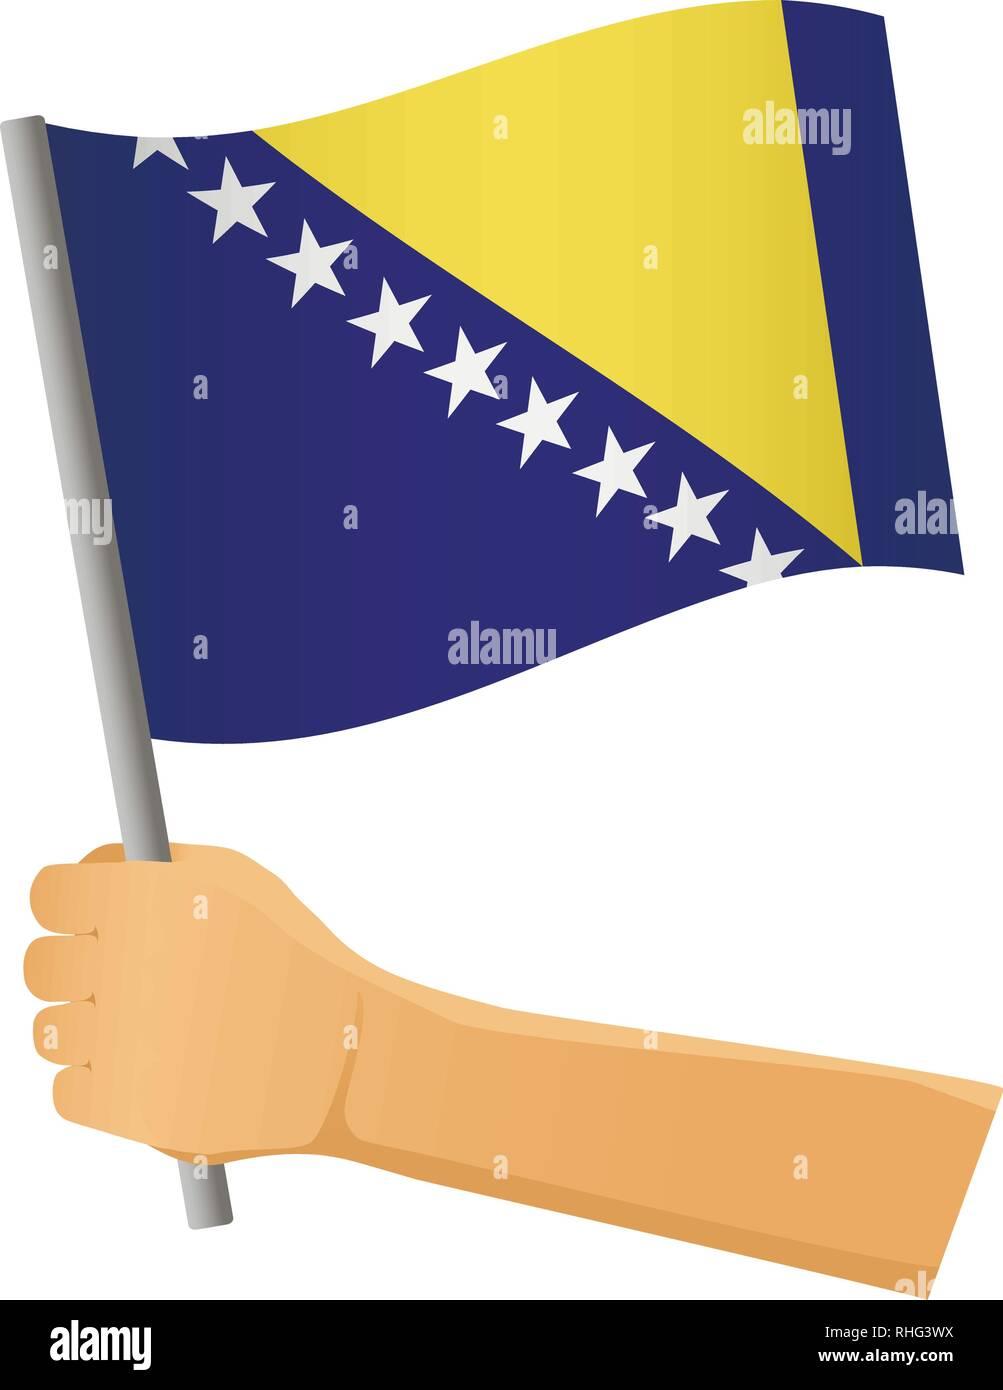 Bosnia and Herzegovina flag in hand. Patriotic background. National flag of Bosnia and Herzegovina vector illustration - Stock Vector